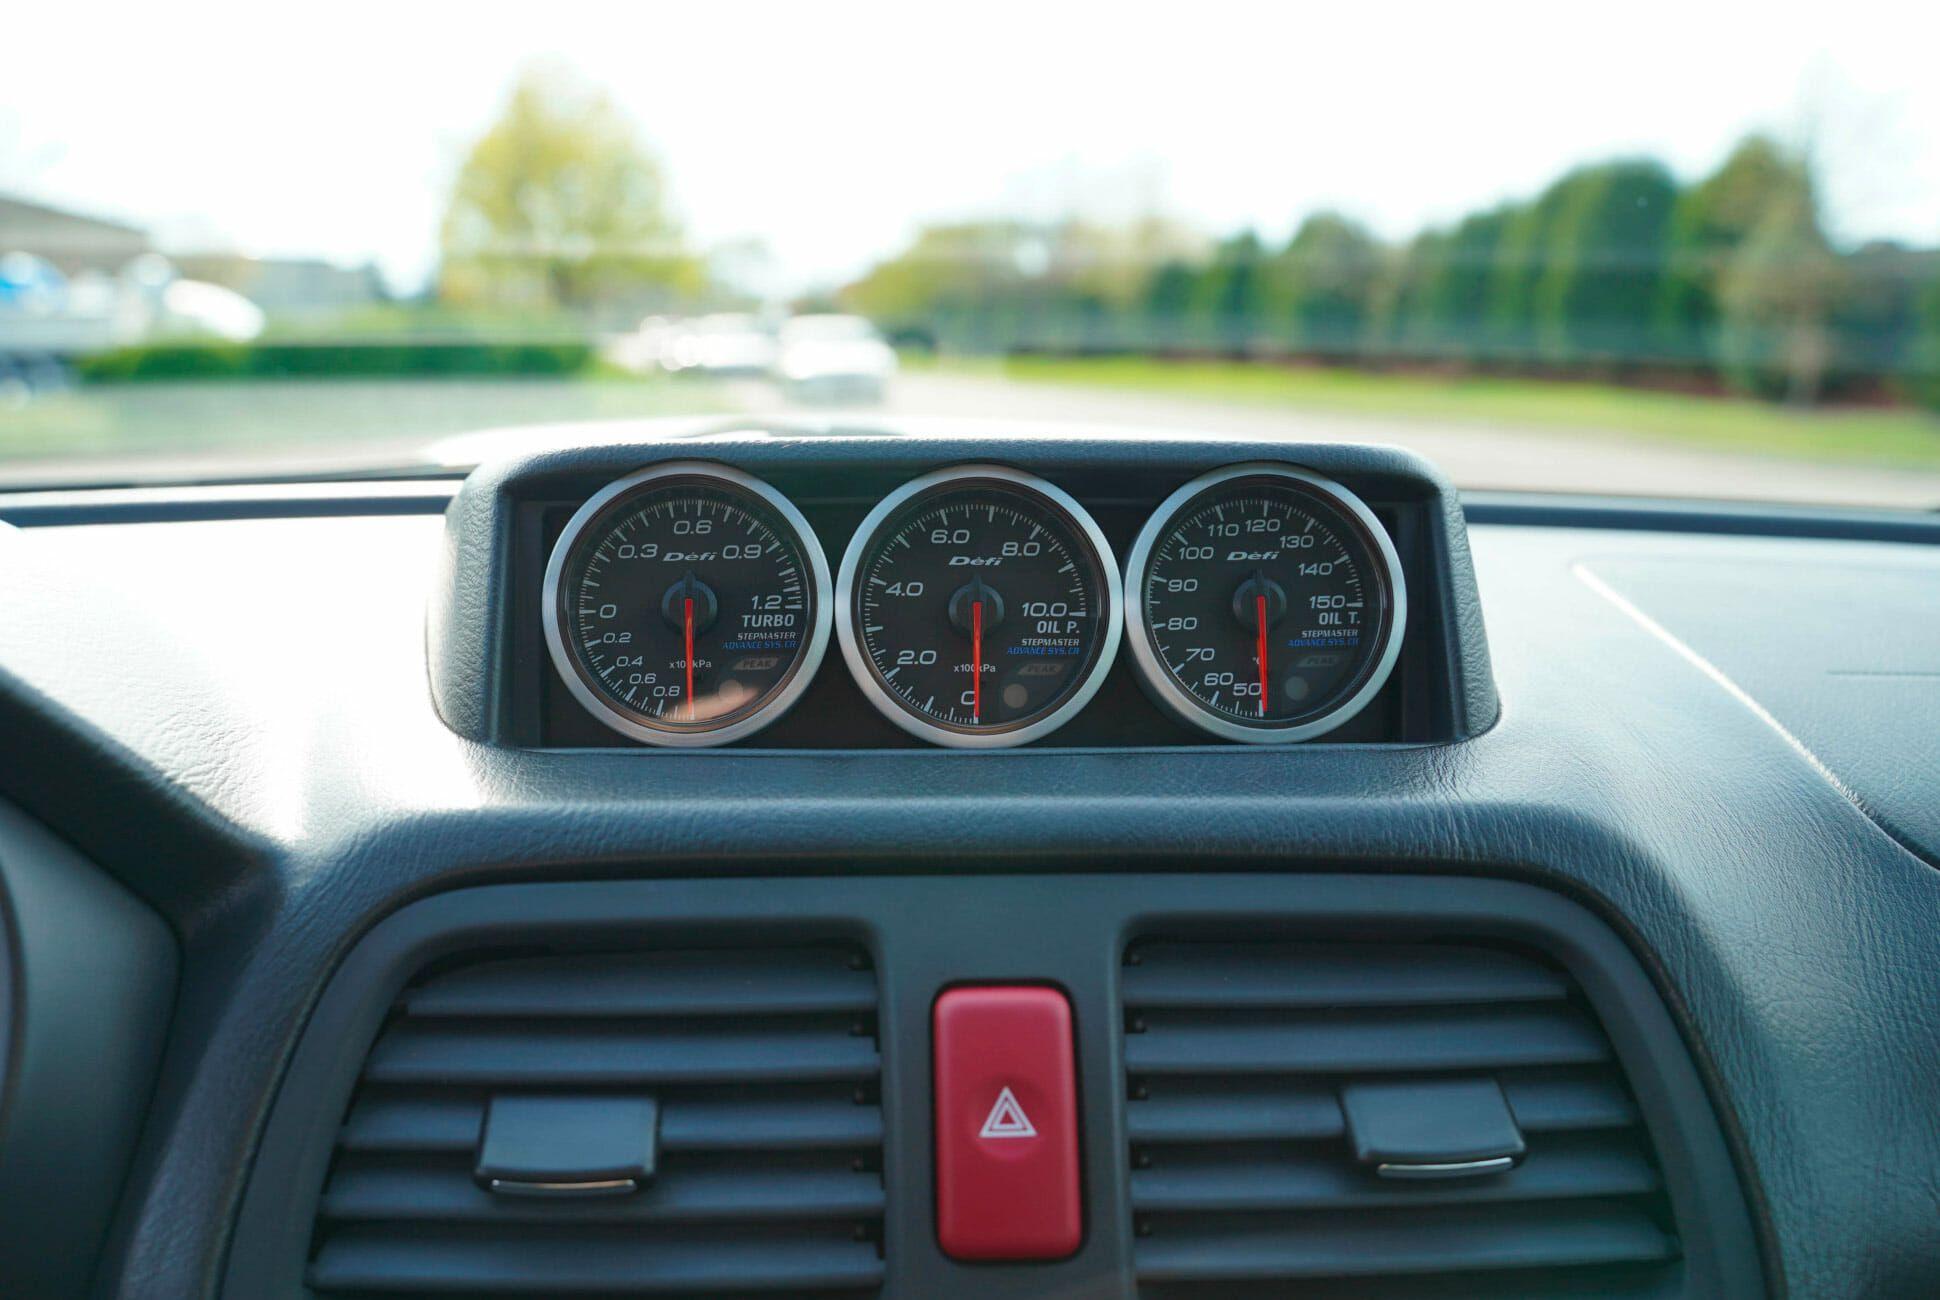 2007-Subaru-WRX-Wagon-14K-Miles-gear-patrol-slide-10